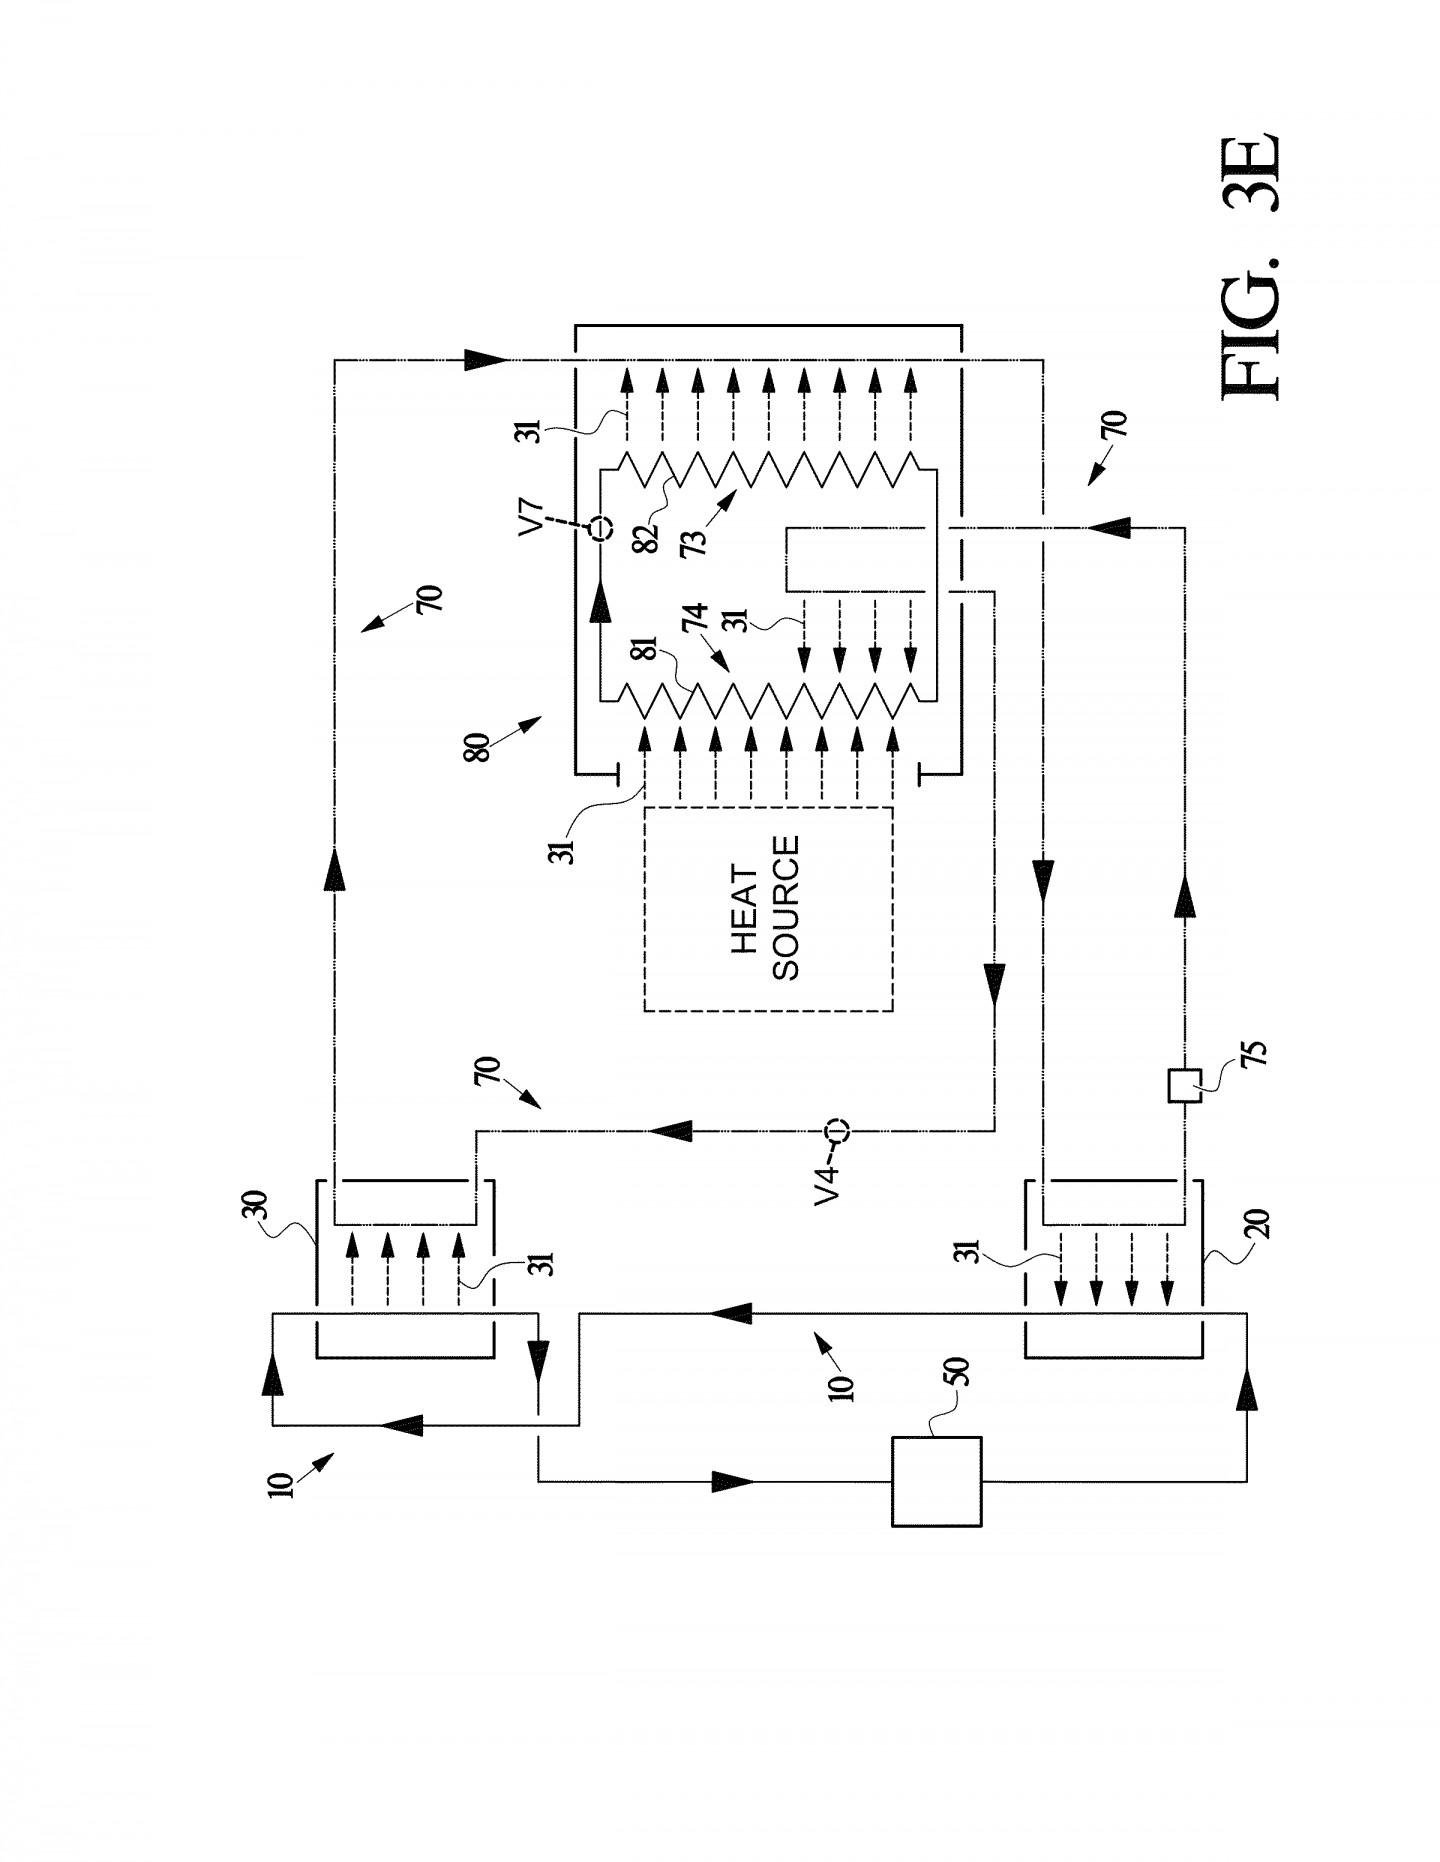 Electrical Wiring Diagrams Residential 220 Schematic 240 Volt Generator Extech Work Diagram U2022 Plug